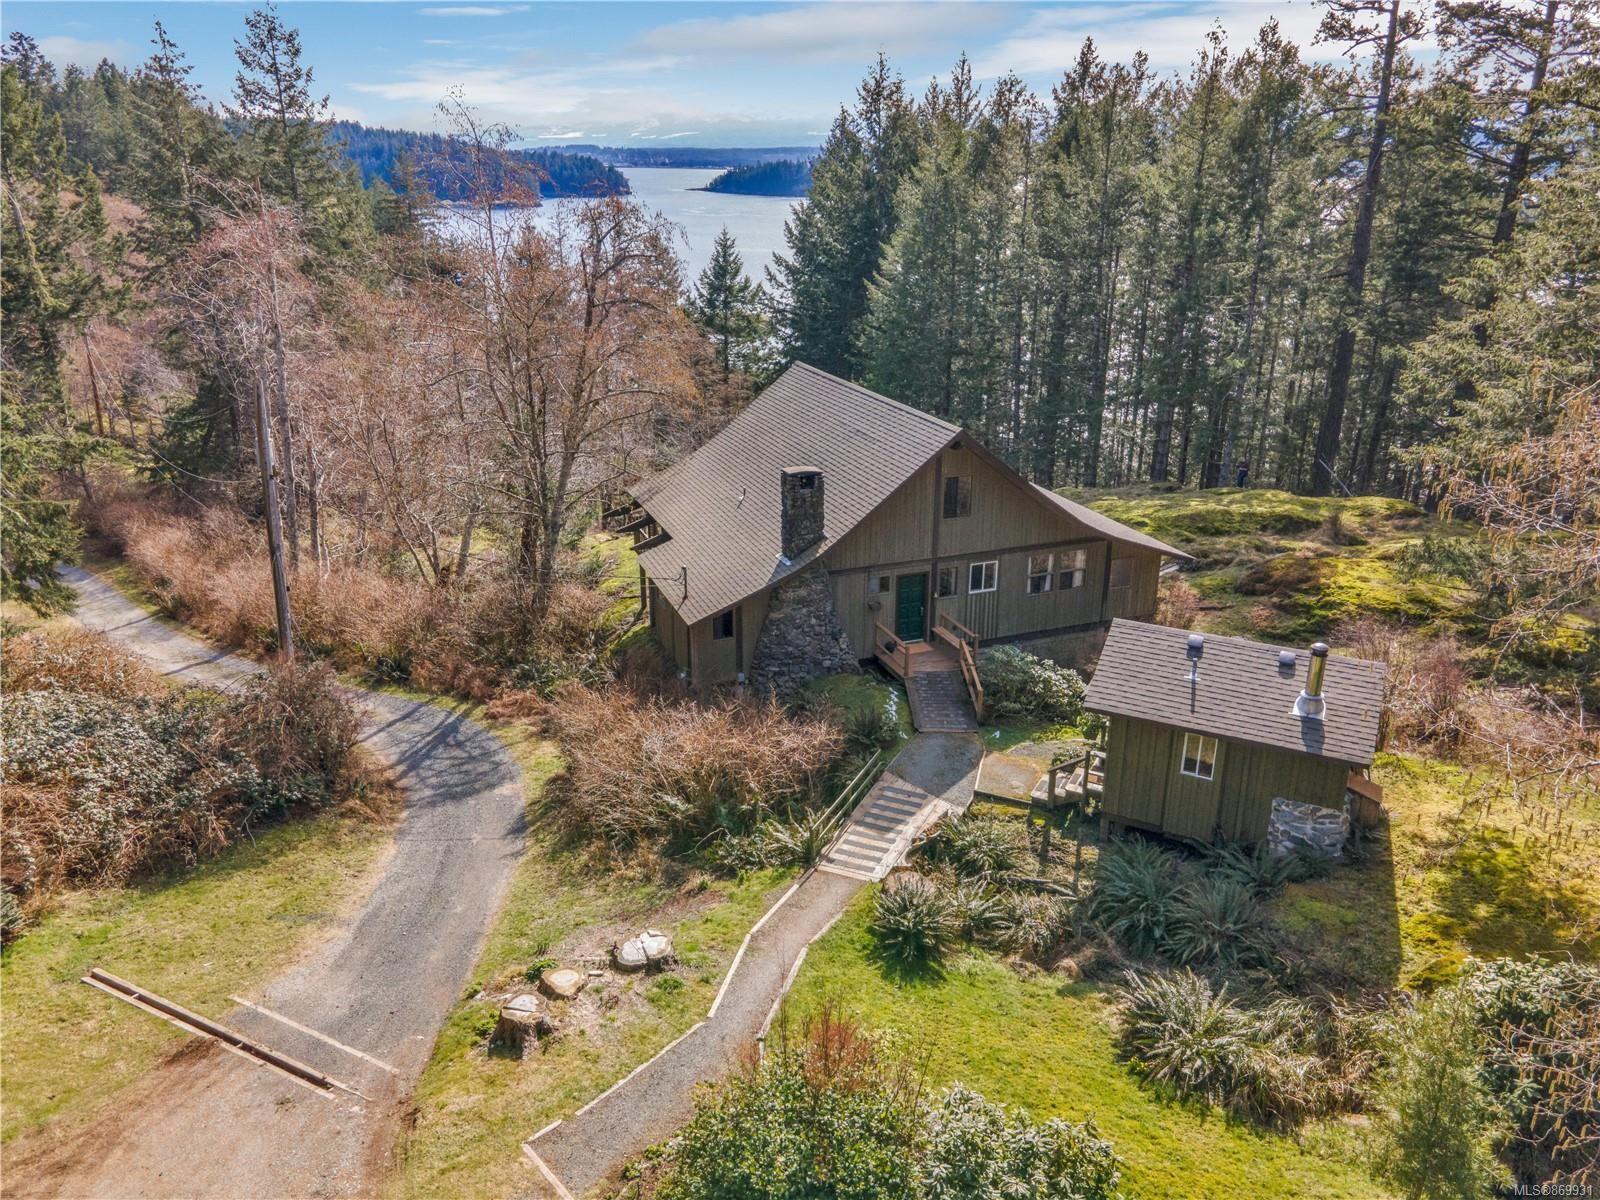 Main Photo: 1019 GOWLLAND HARBOUR Rd in : Isl Quadra Island House for sale (Islands)  : MLS®# 869931